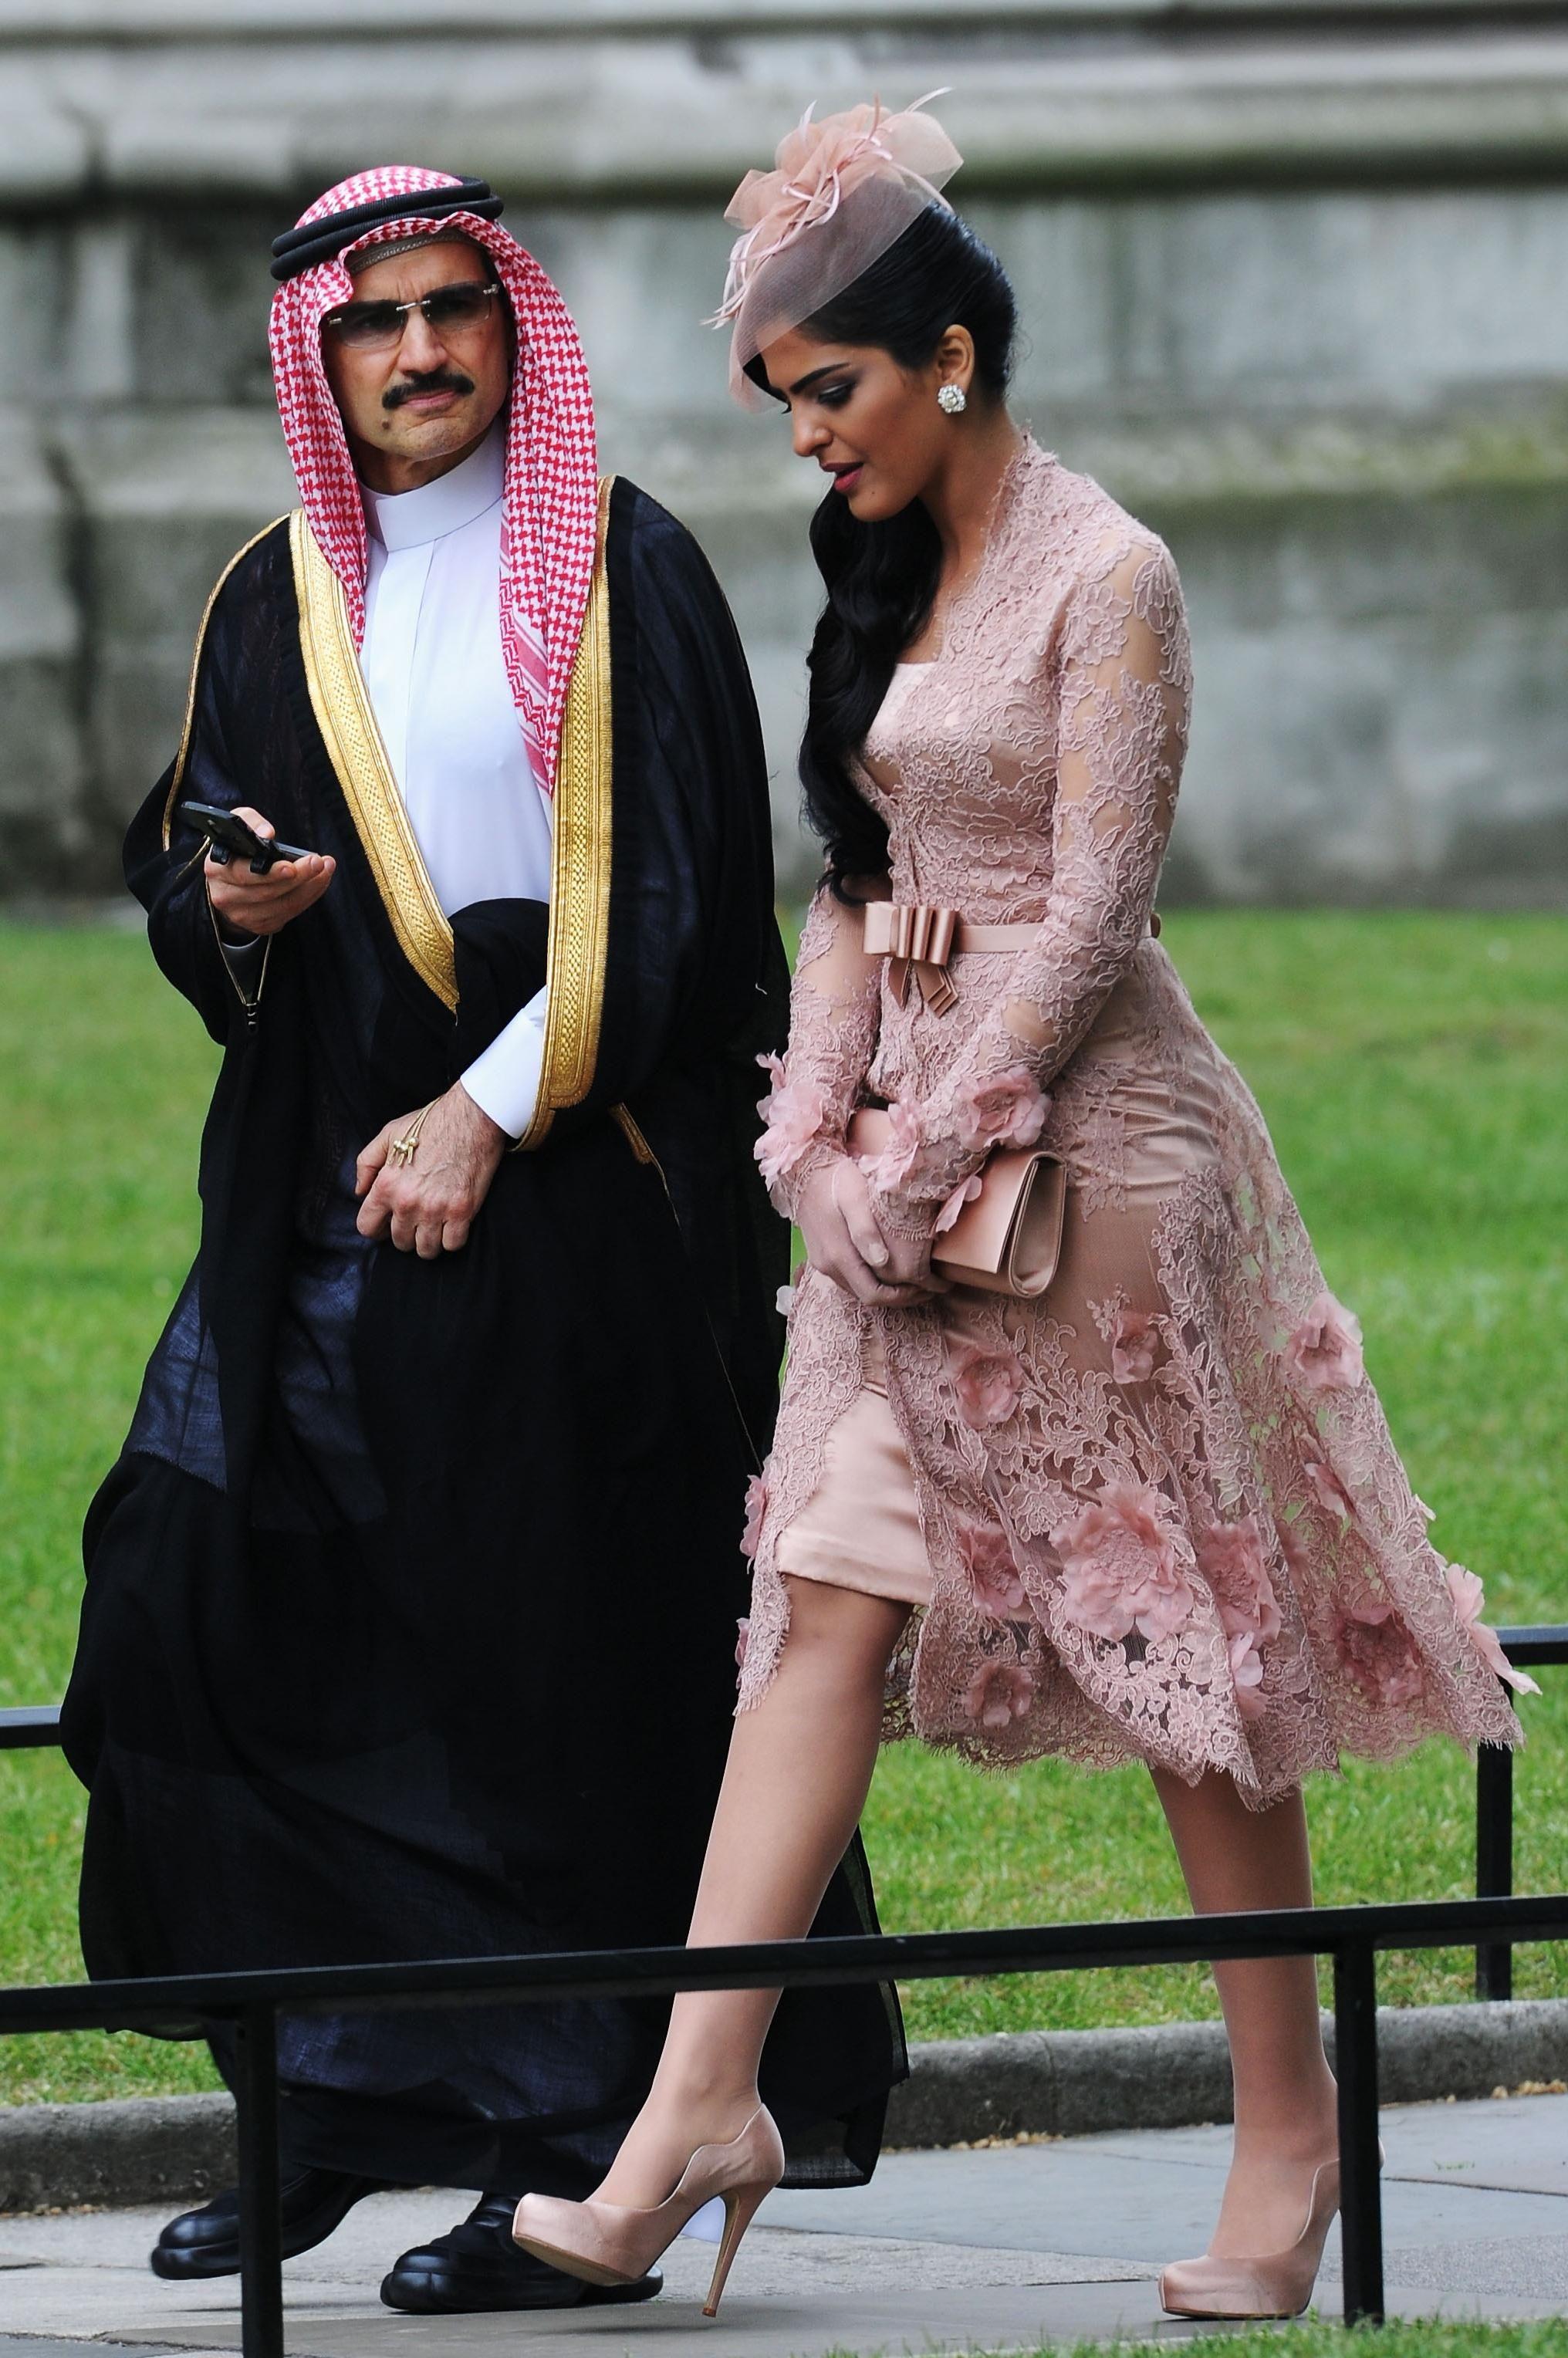 Alwaleed Bin Talal Meet The Saudi Prince Giving Away All His Money